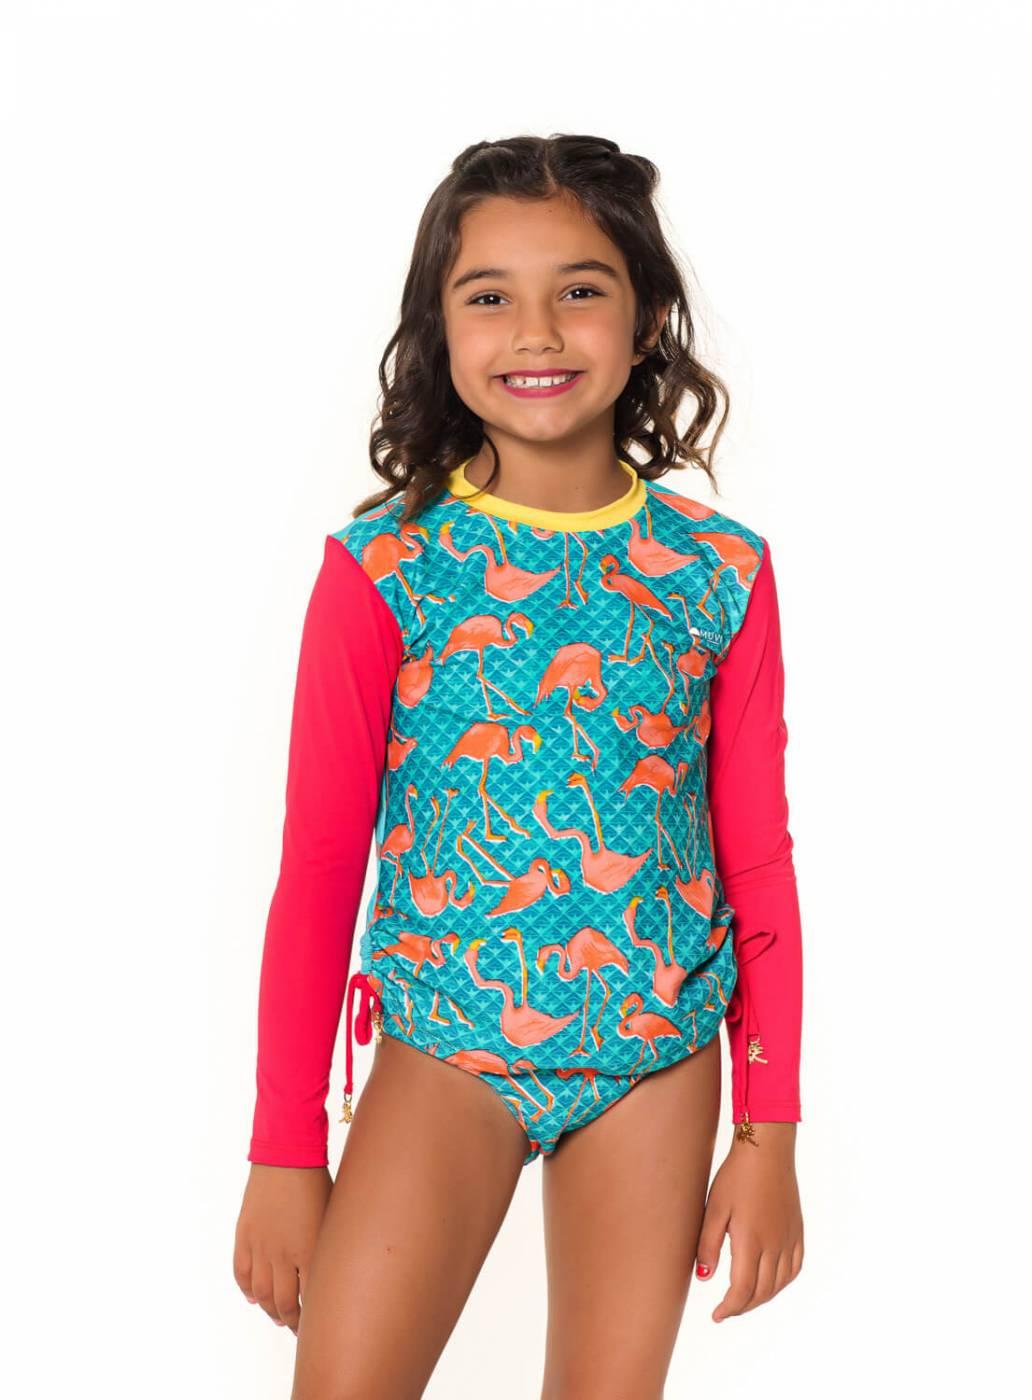 Camiseta Kids UV Proteção Solar Sirena